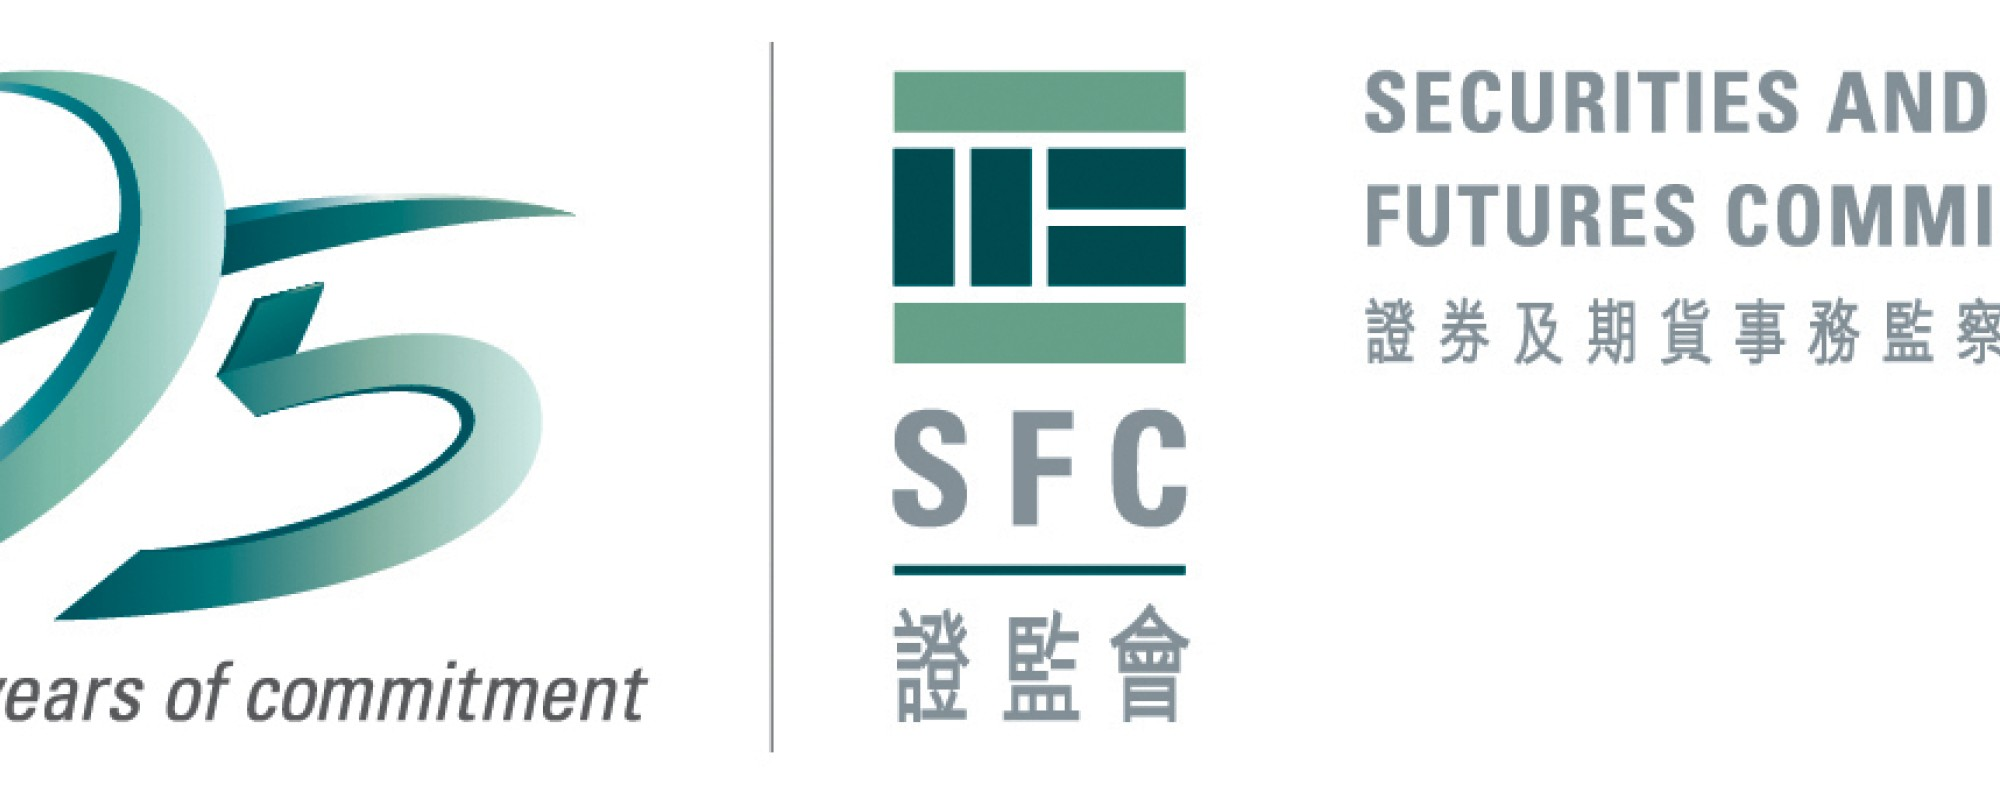 SFC | South China Morning Post